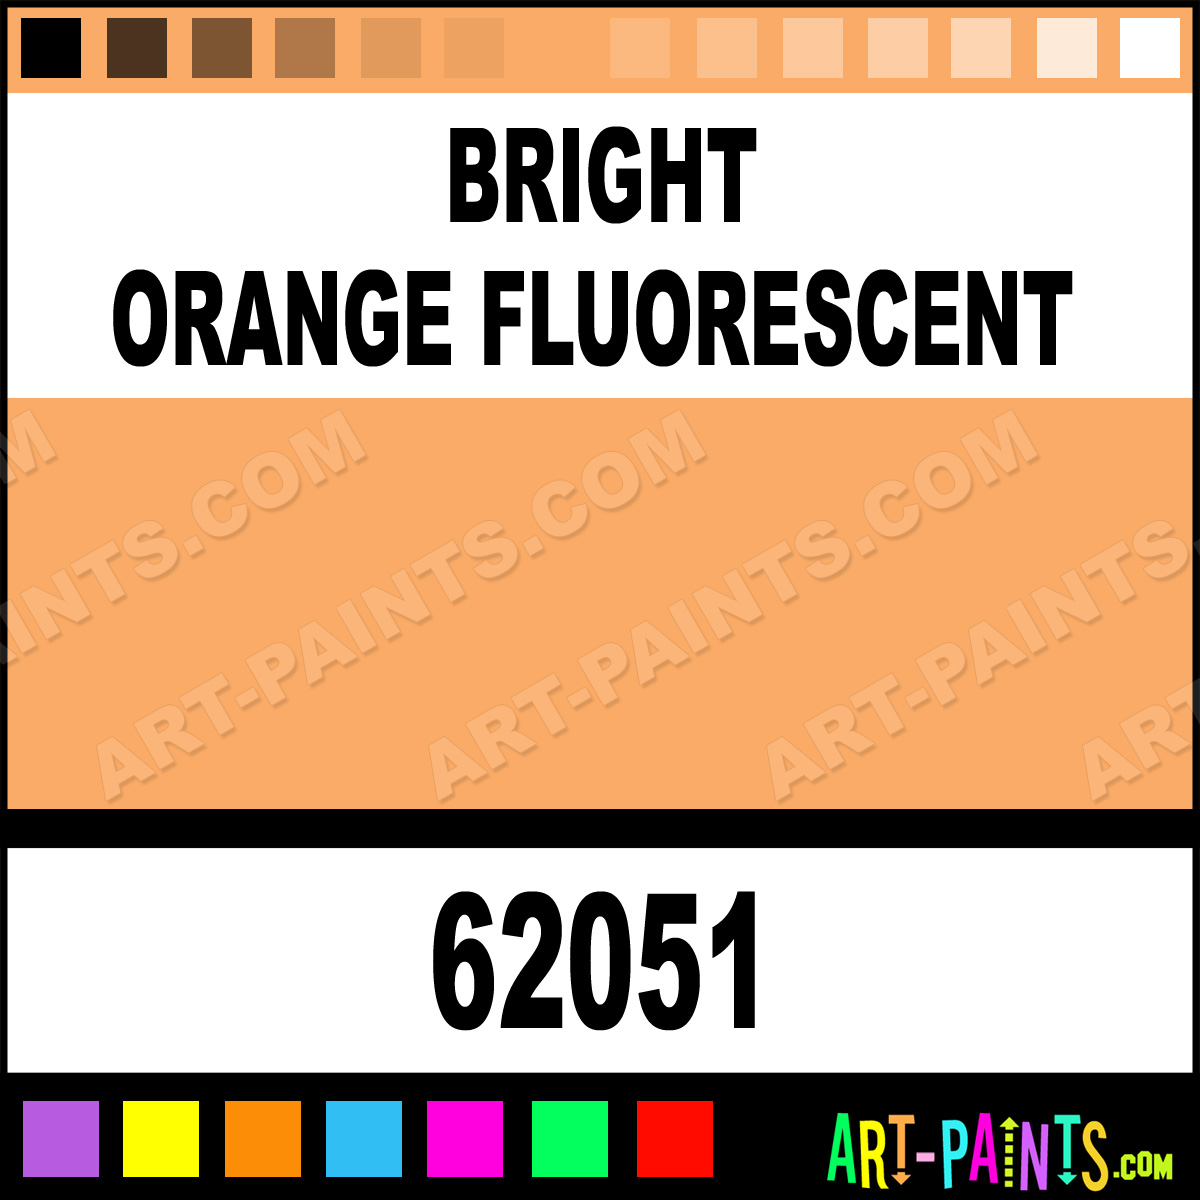 Bright Orange Fluorescent Pro Color Airbrush Spray Paints